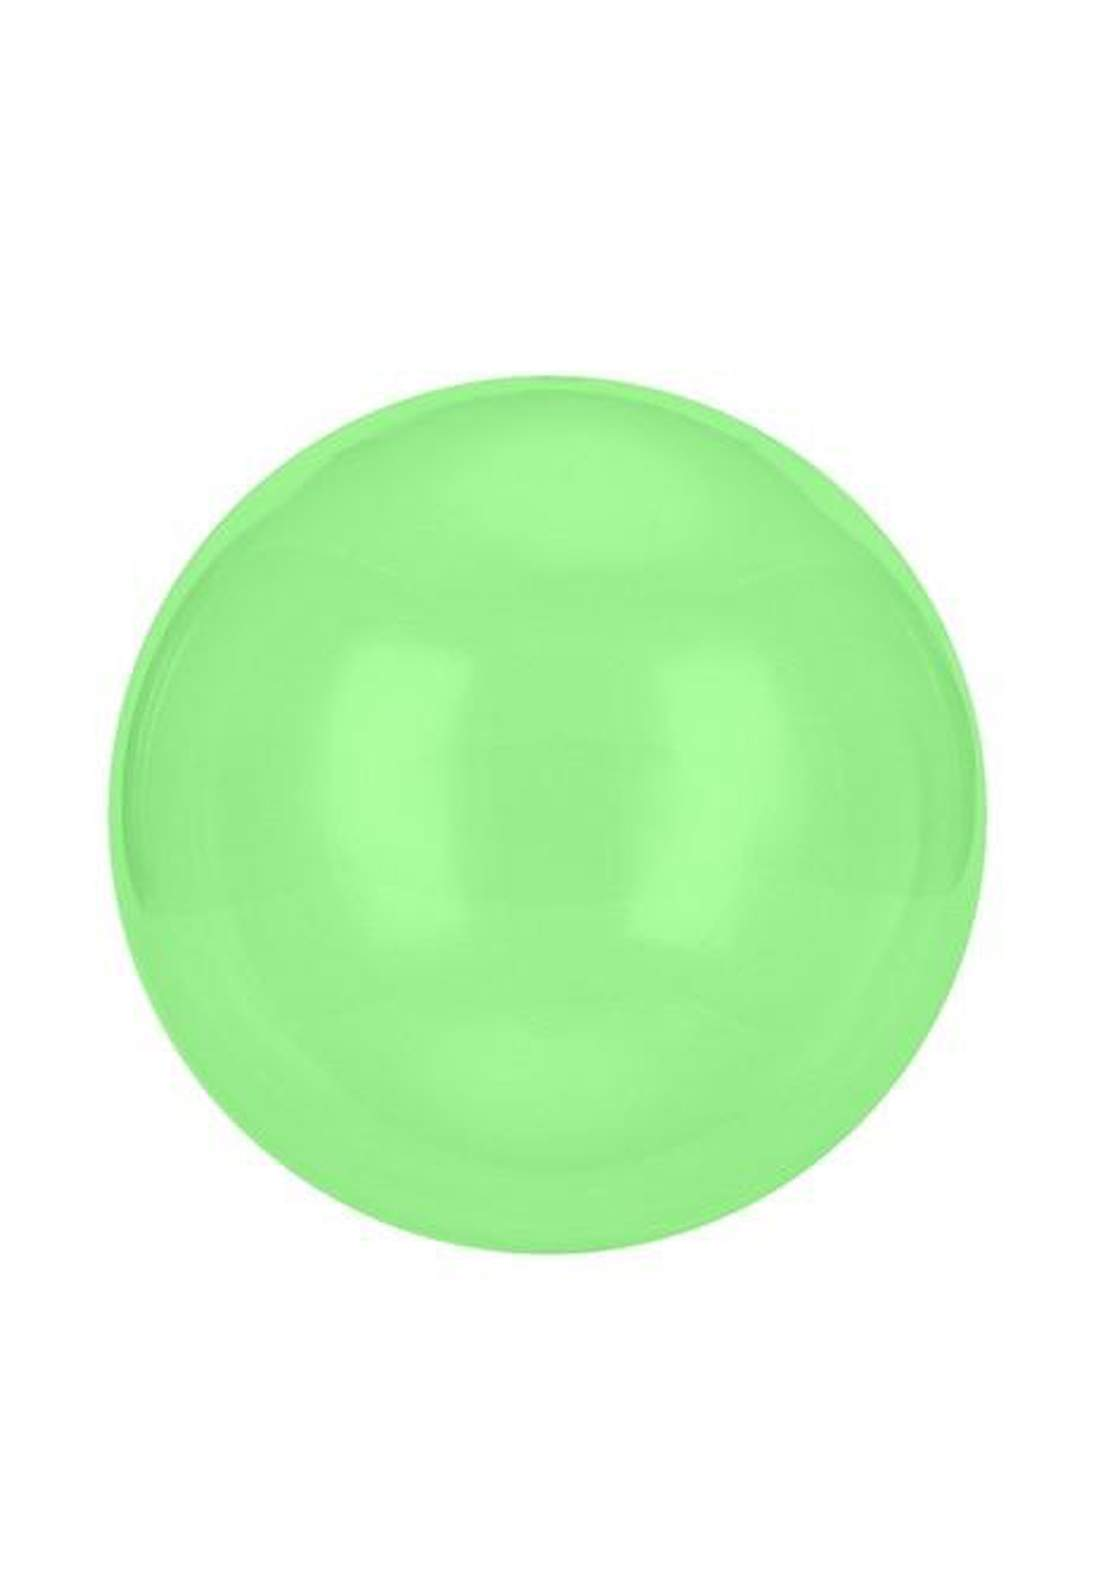 Stick Wall Ball Soft Stress Relief Toys كرة مضيئة لتخفيف التوتر